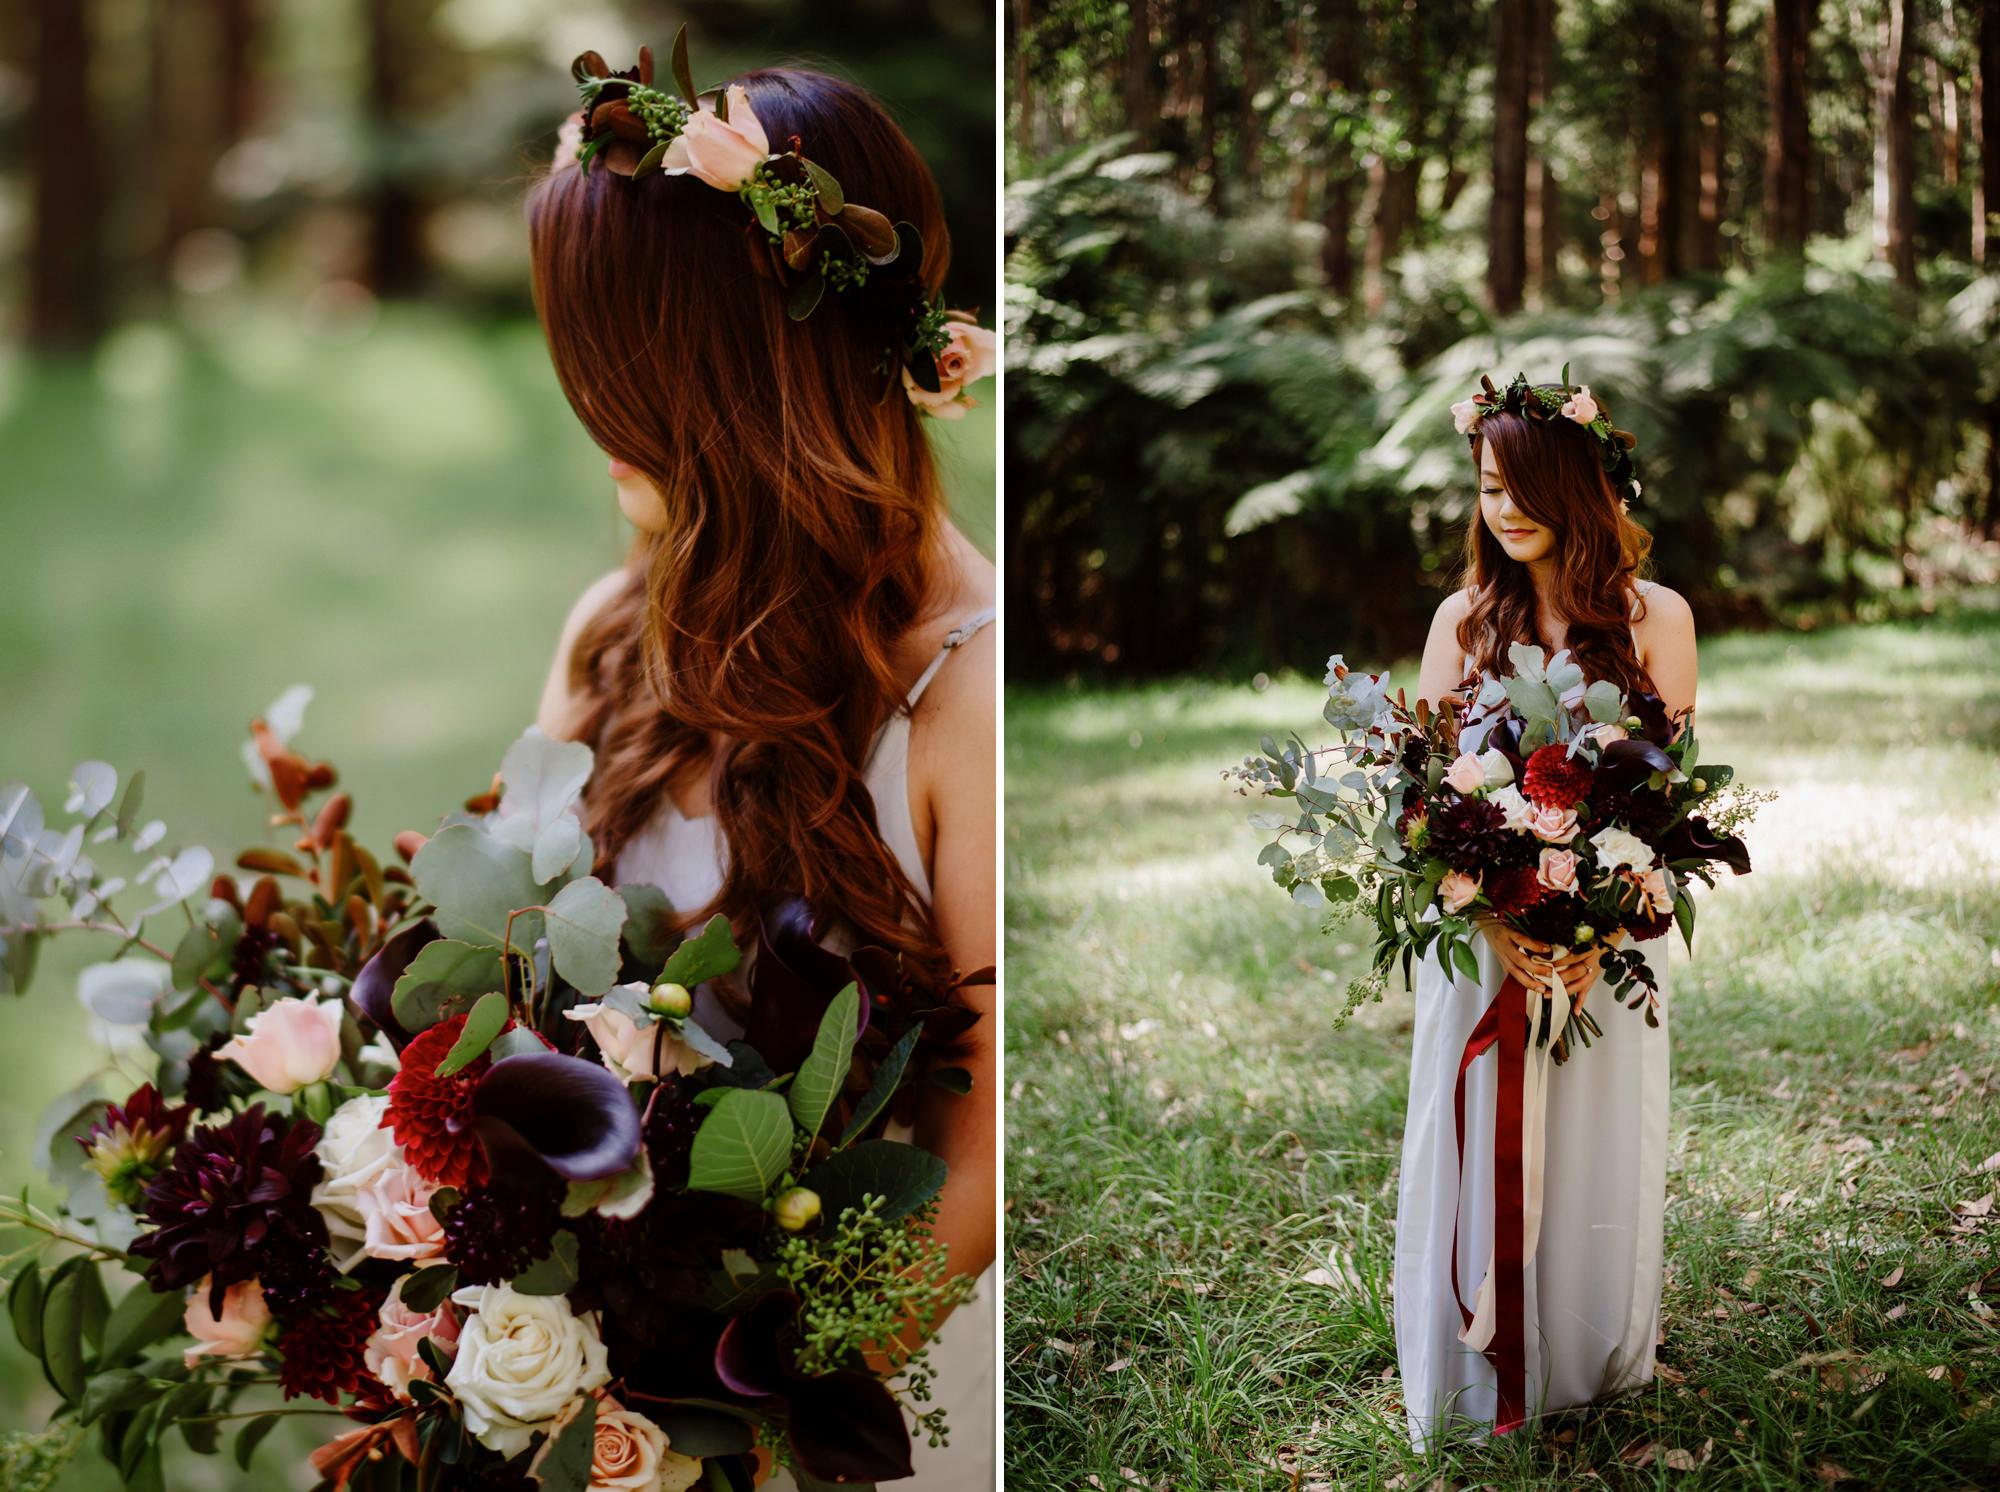 003-melbourne-engagement-wedding-photography